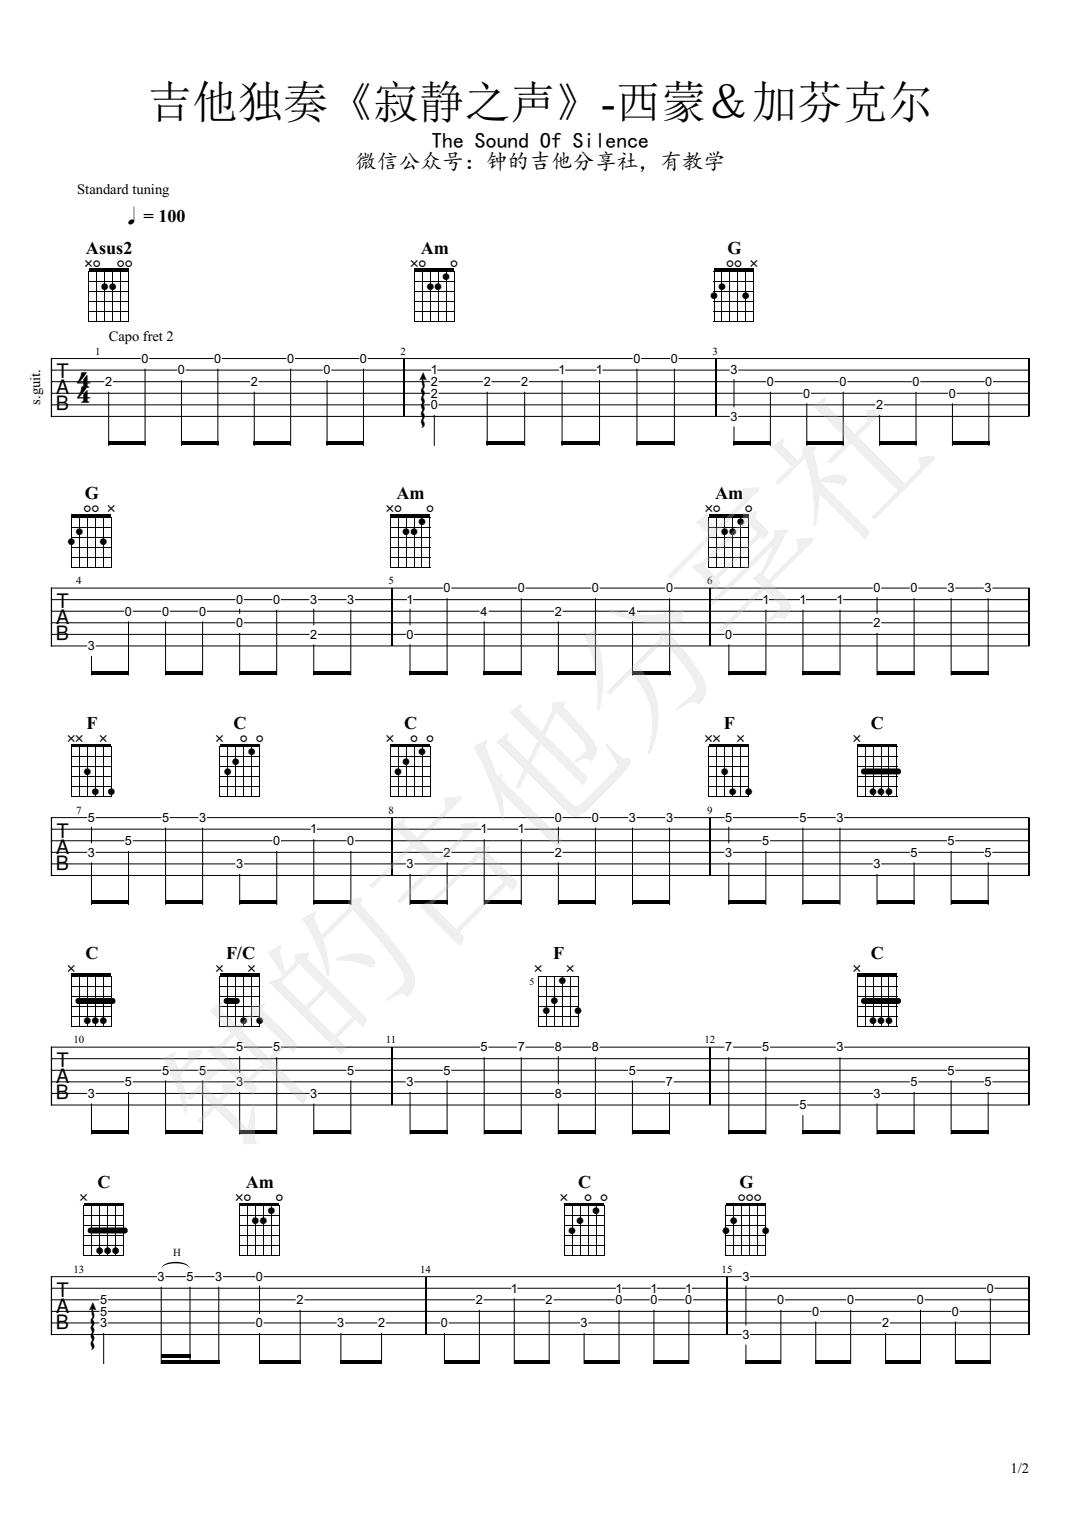 The Sound of Silence(寂静之声)吉他指弹谱-1